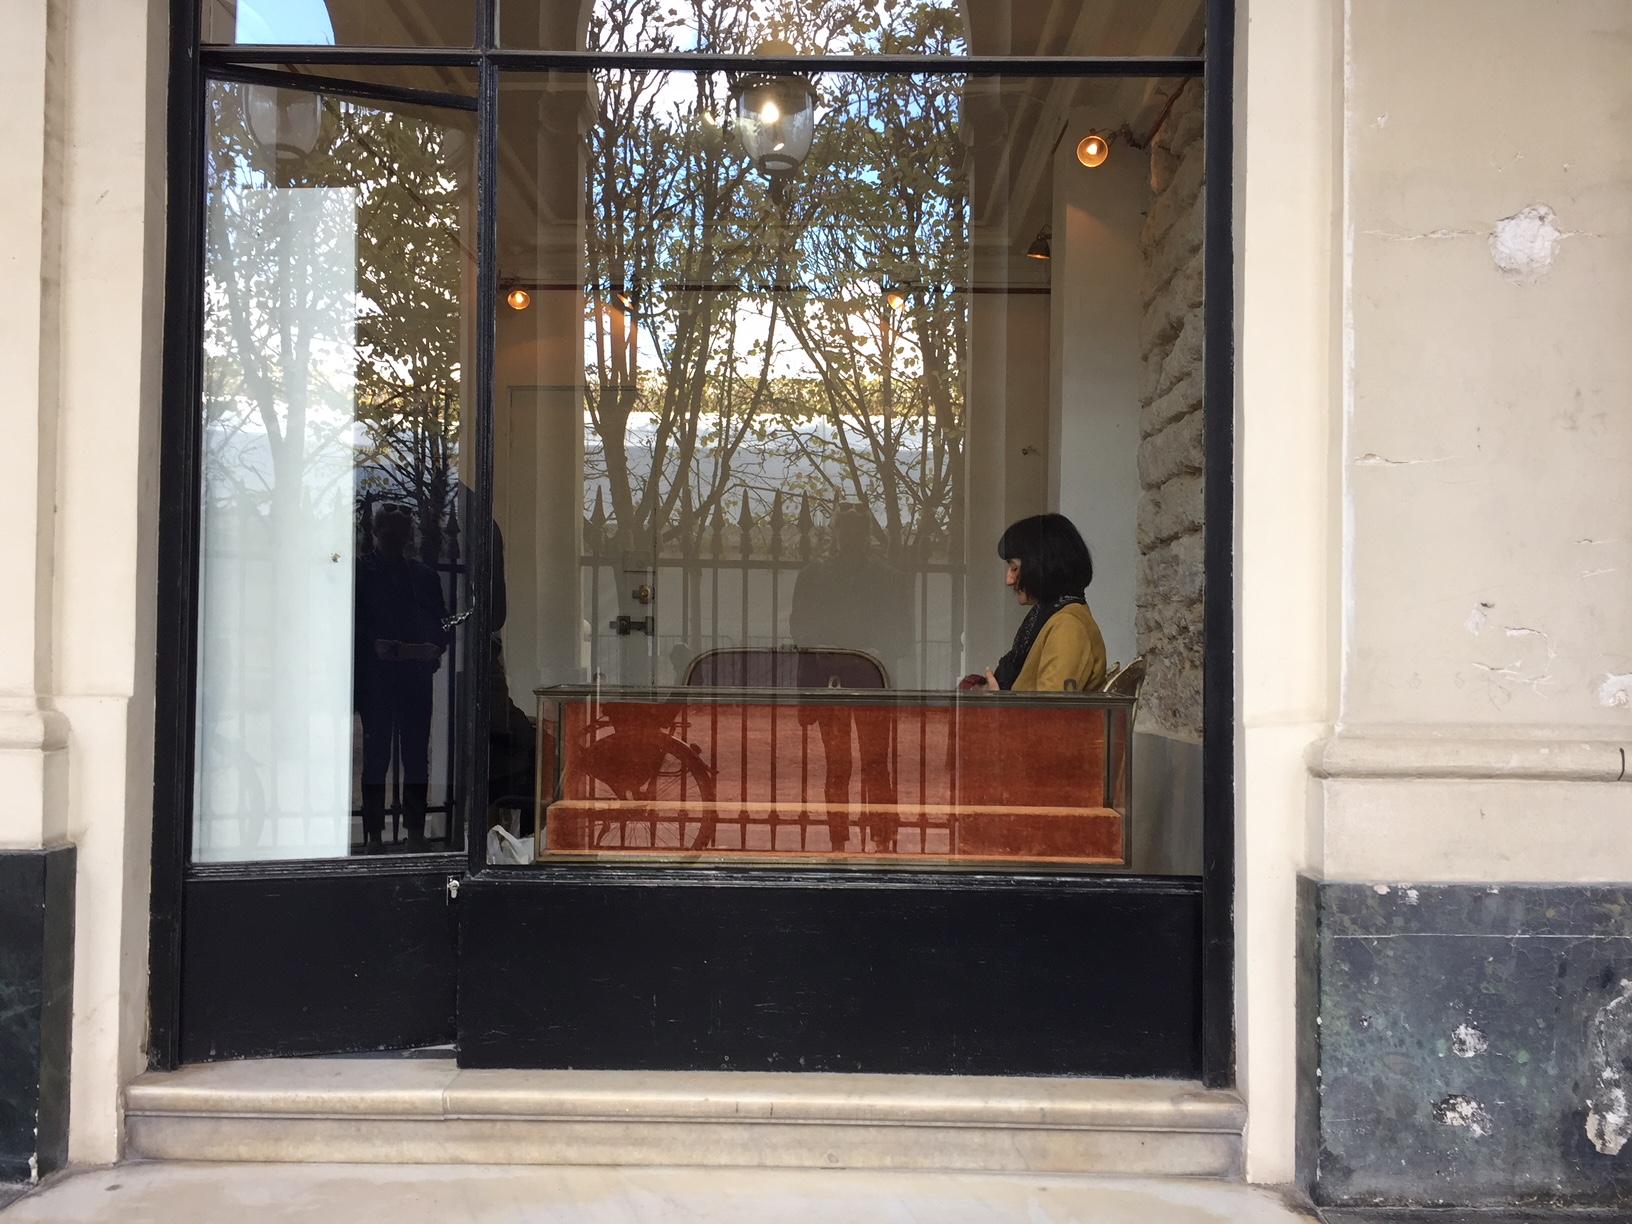 Goton & Reena Spaulings Fine Art — Exposition, Goton Paris